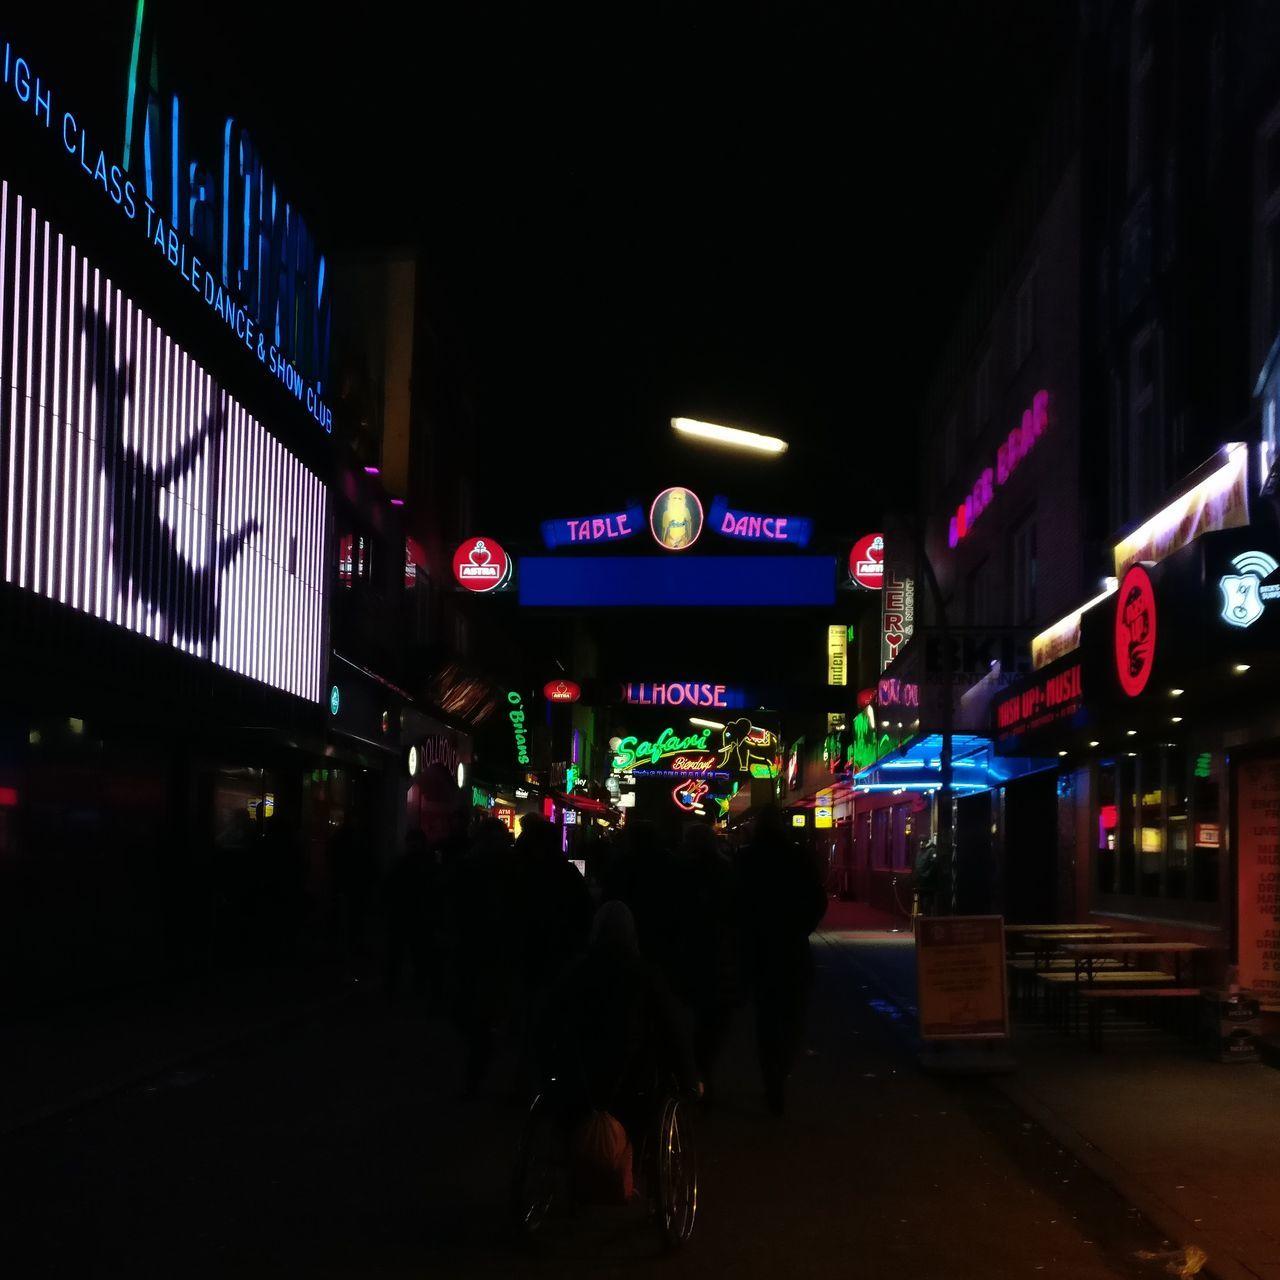 Hamburg Reeperbahn  Großefreiheit Stpauli Night Nightphotography Nightlife Night Lights Party City People Crowd Illuminated Neon Light Neon Colors Colorfull City Lights Nightout Colors Colorful